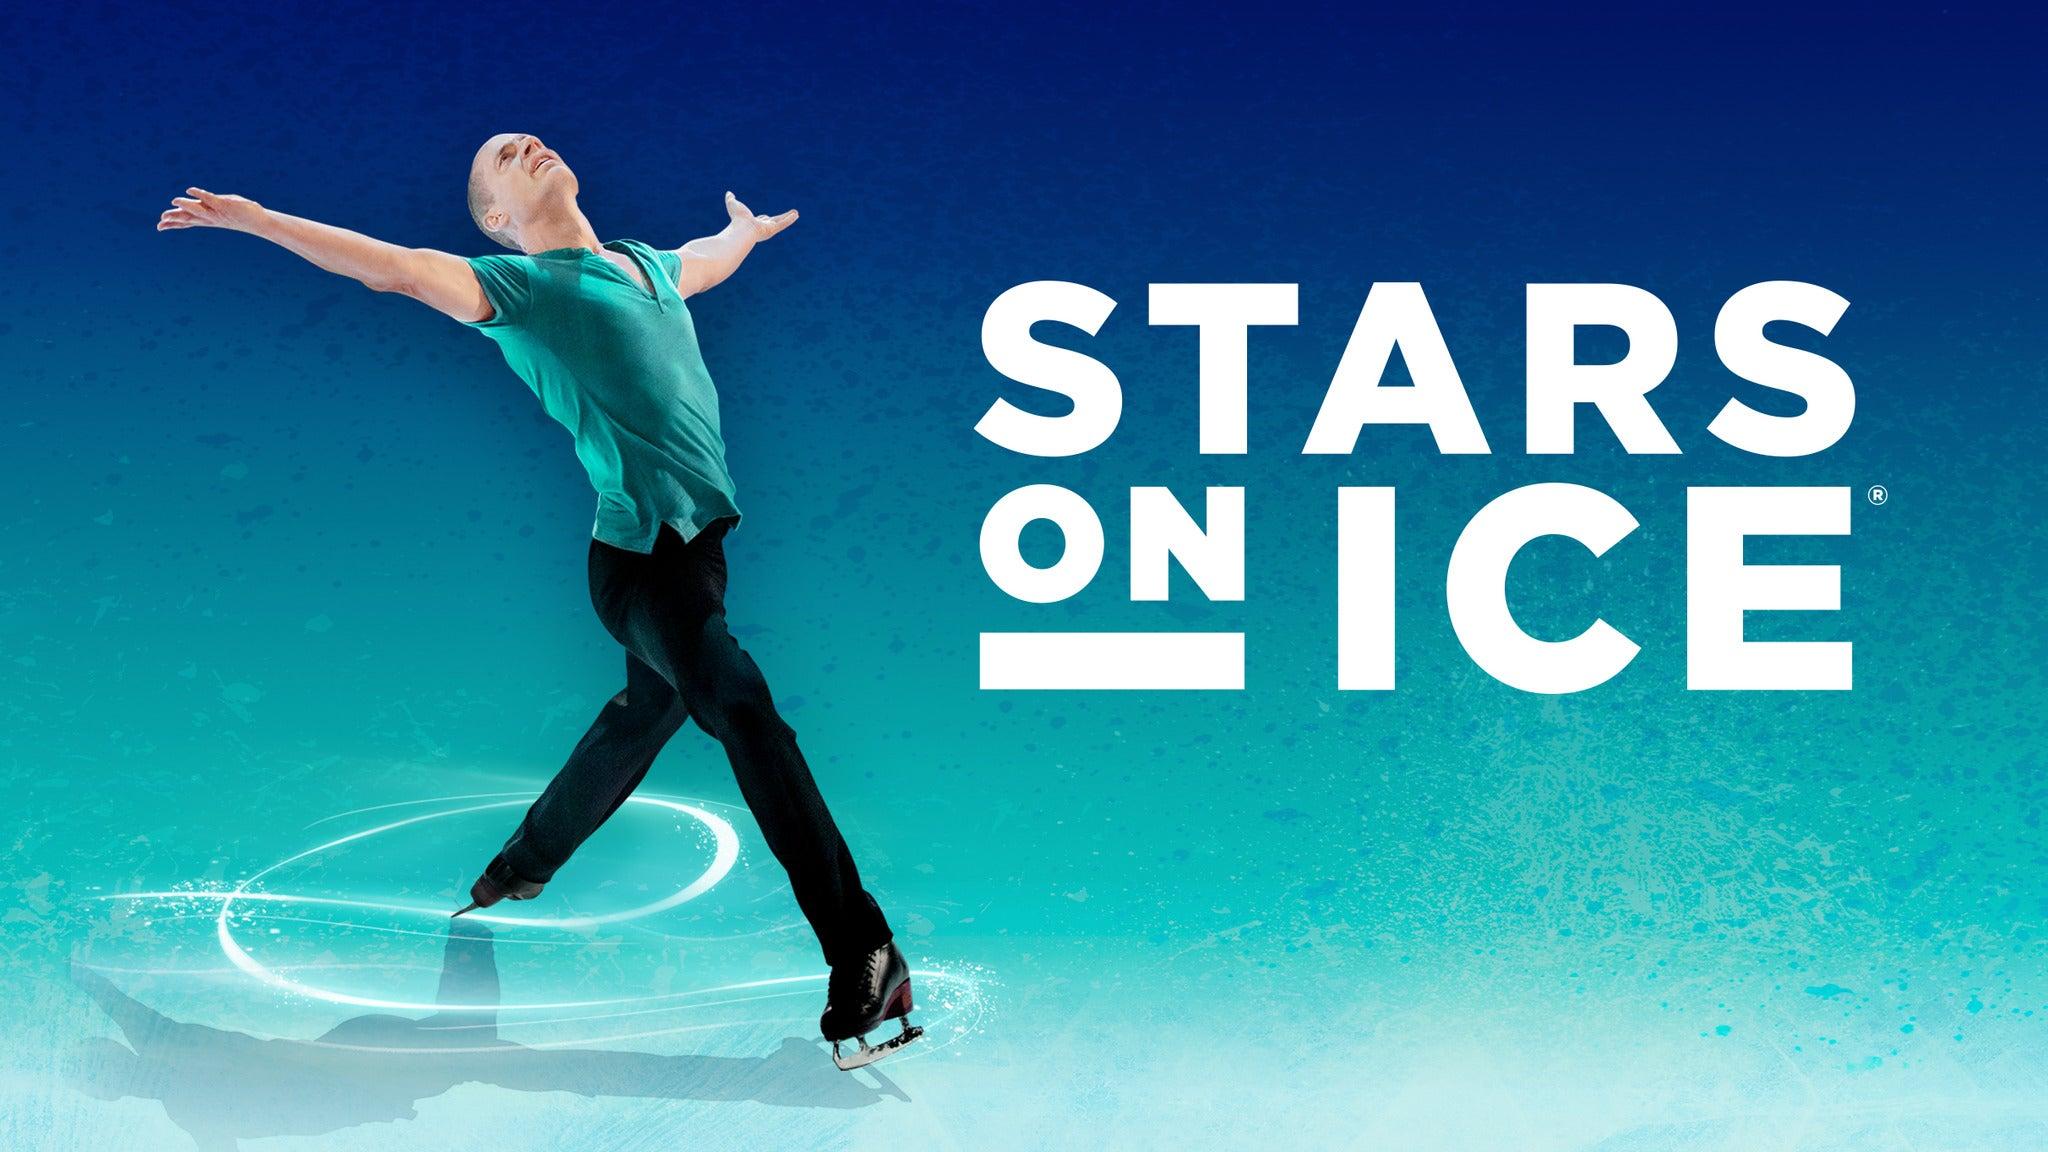 Stars on Ice - Canada presale password